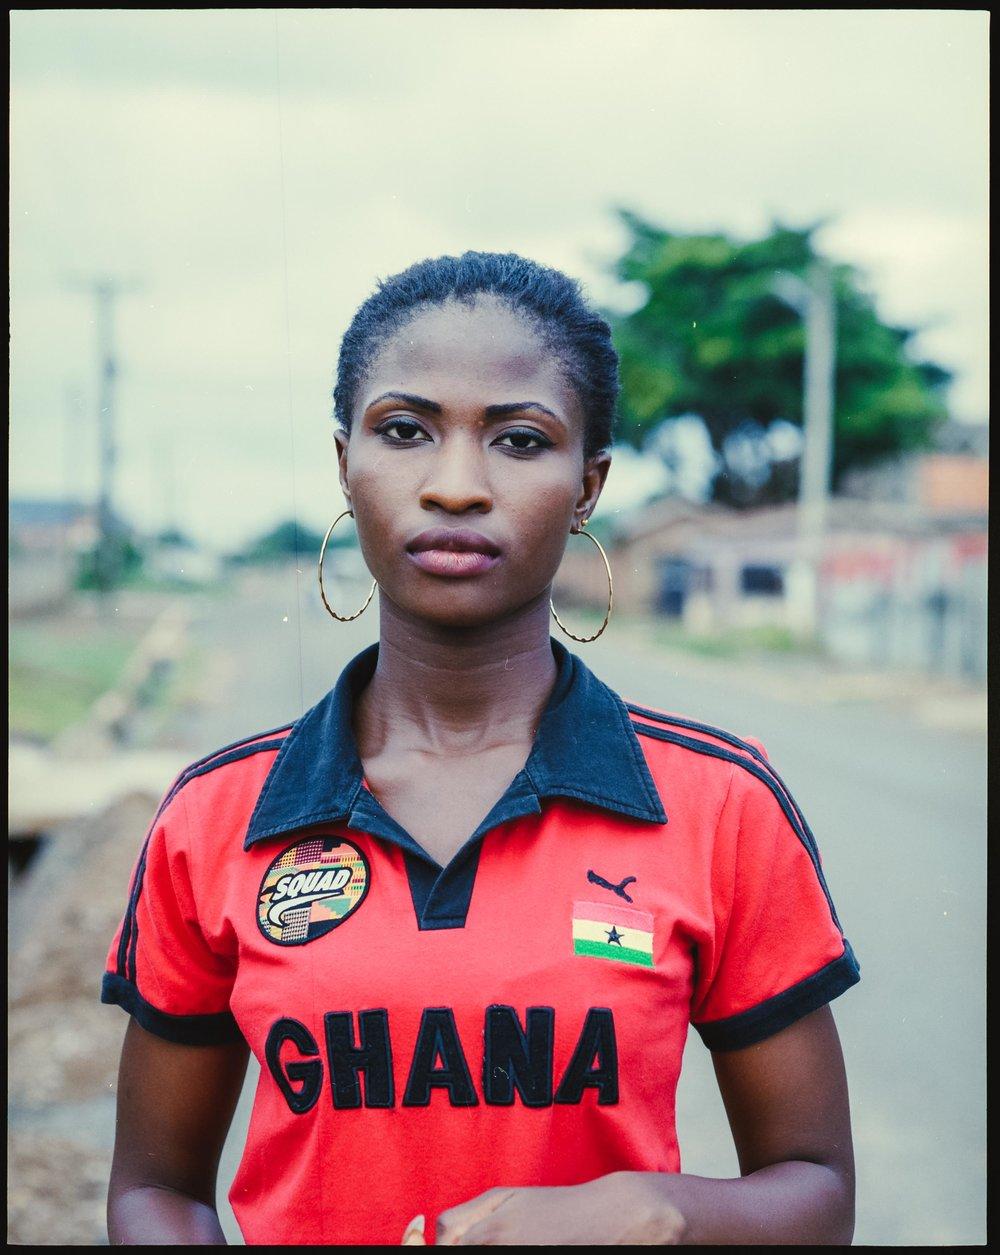 Ghana_Lookbook (2).jpg